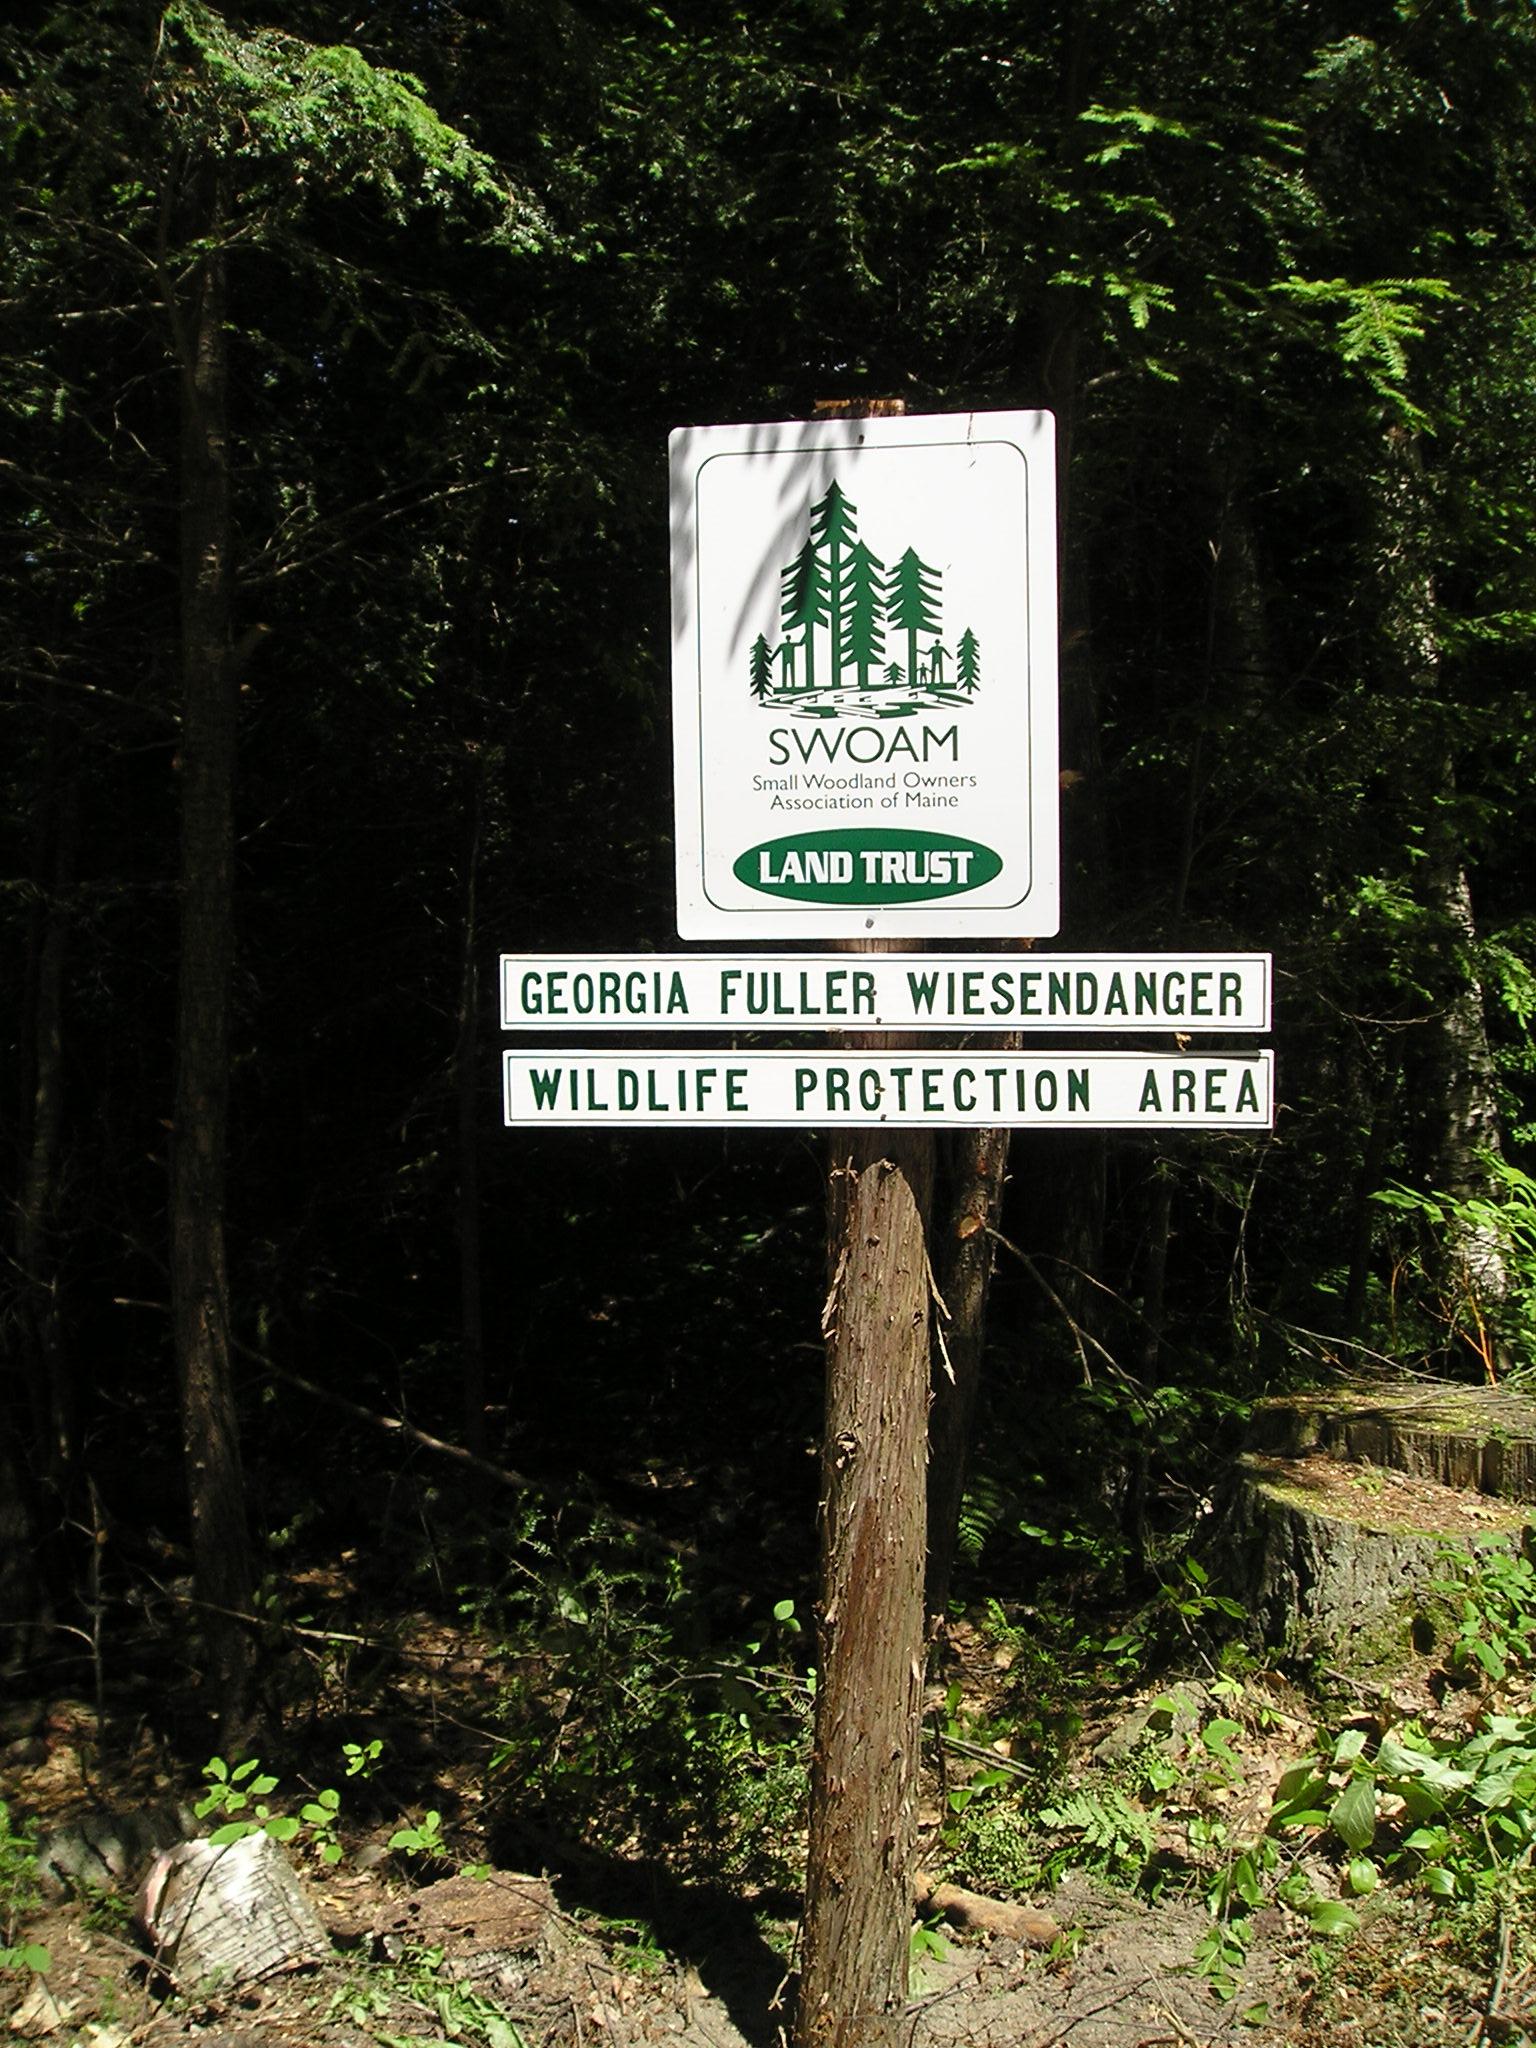 Georgia Fuller Wiesendanger Wildlife Protection Area